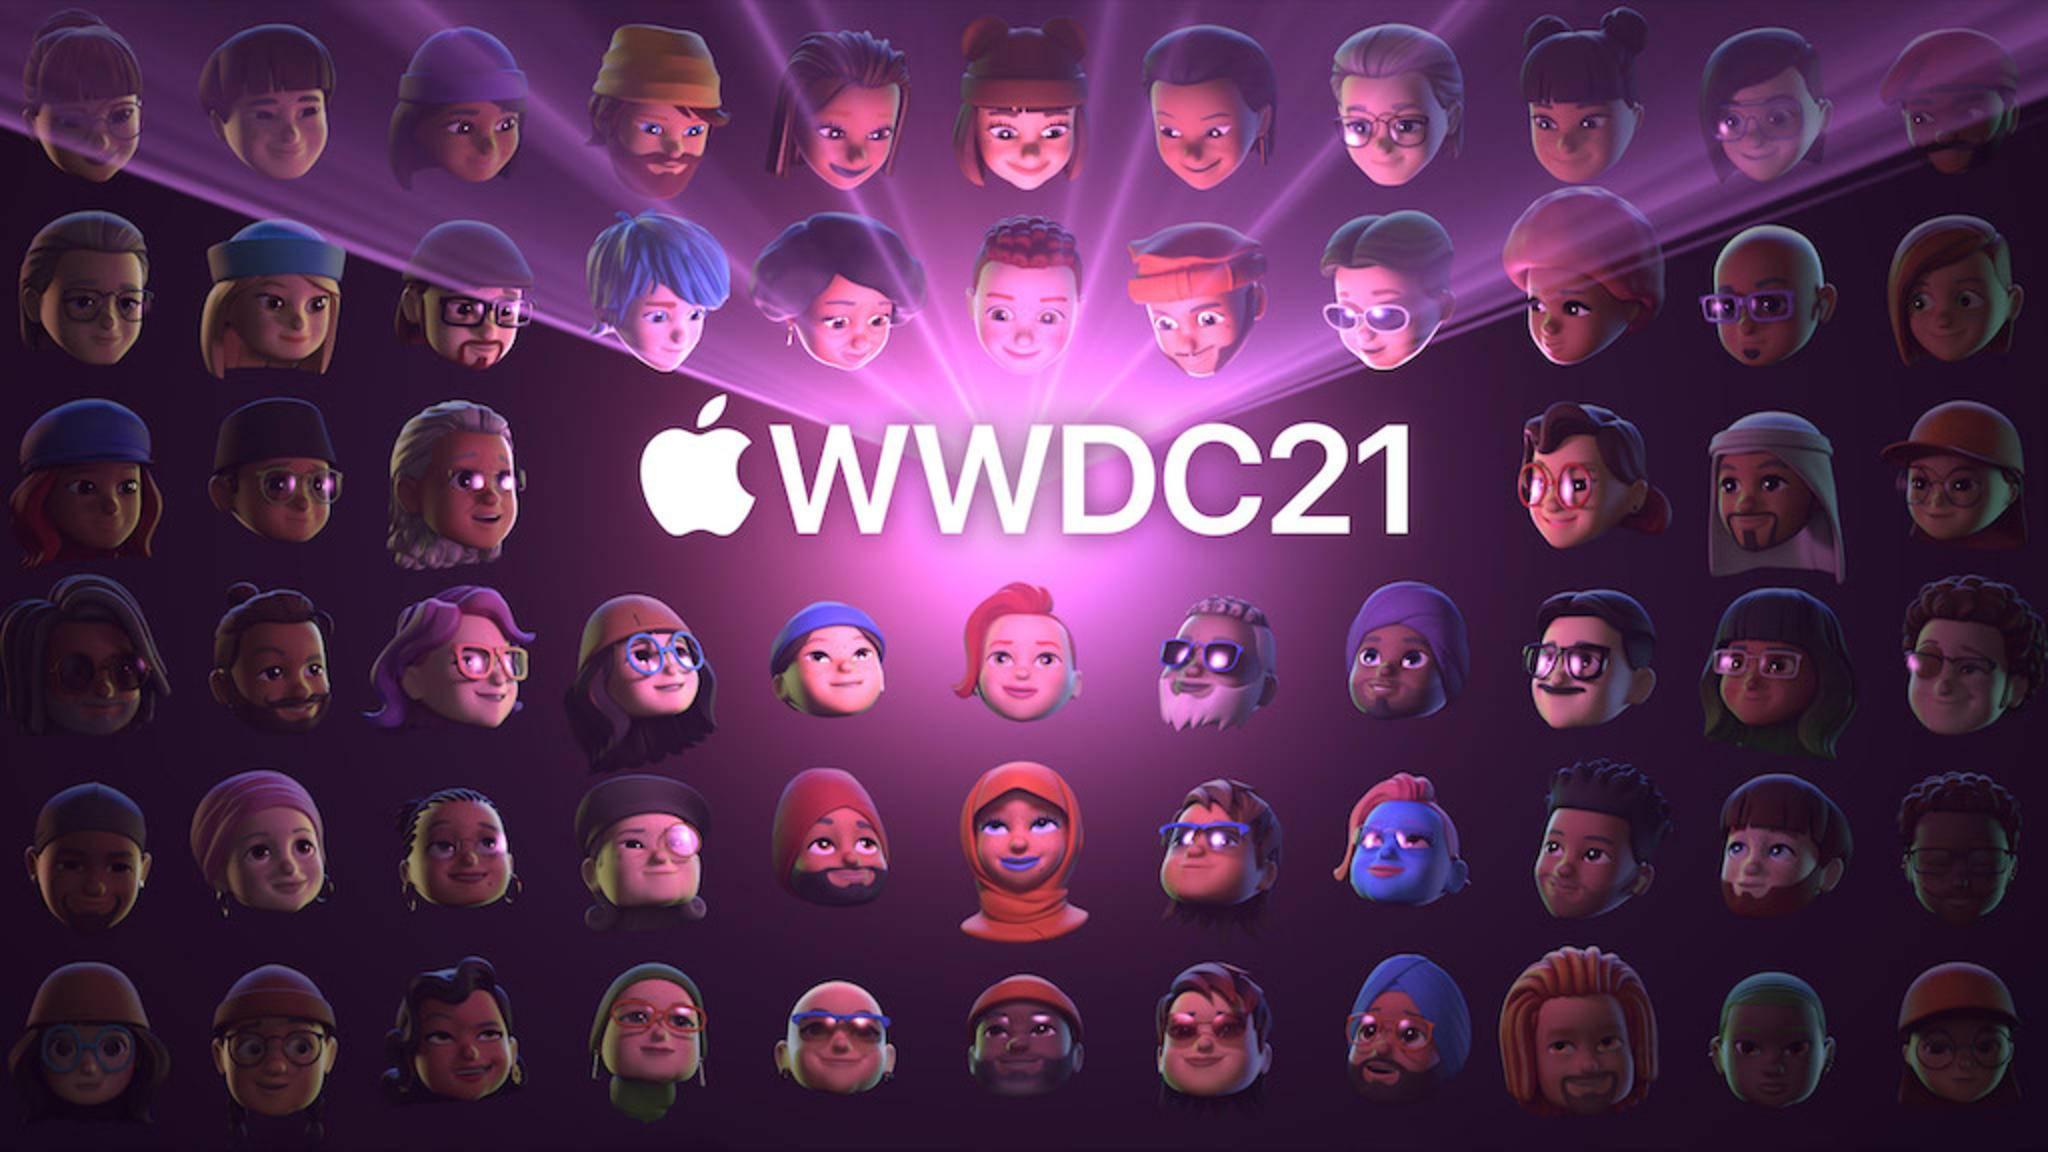 wwdc-2021-teaser